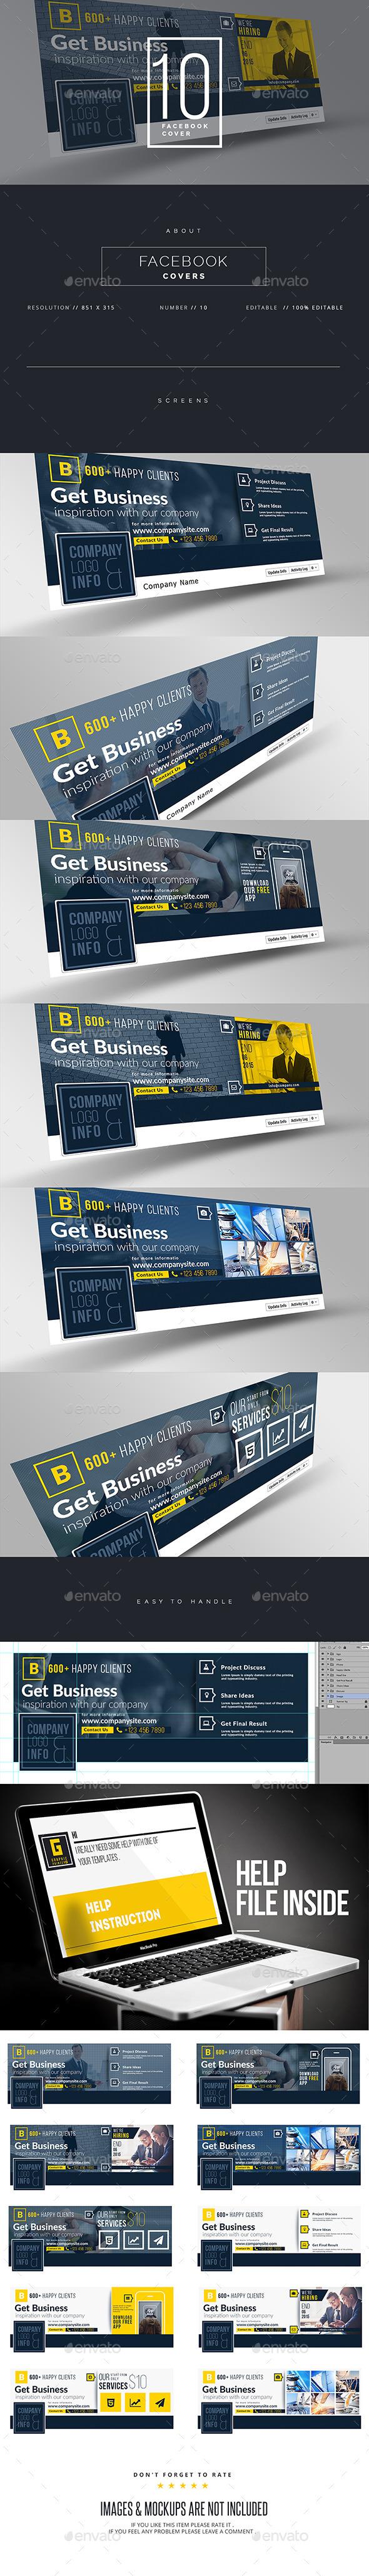 GraphicRiver Corporate Facebook Timeline 11140007